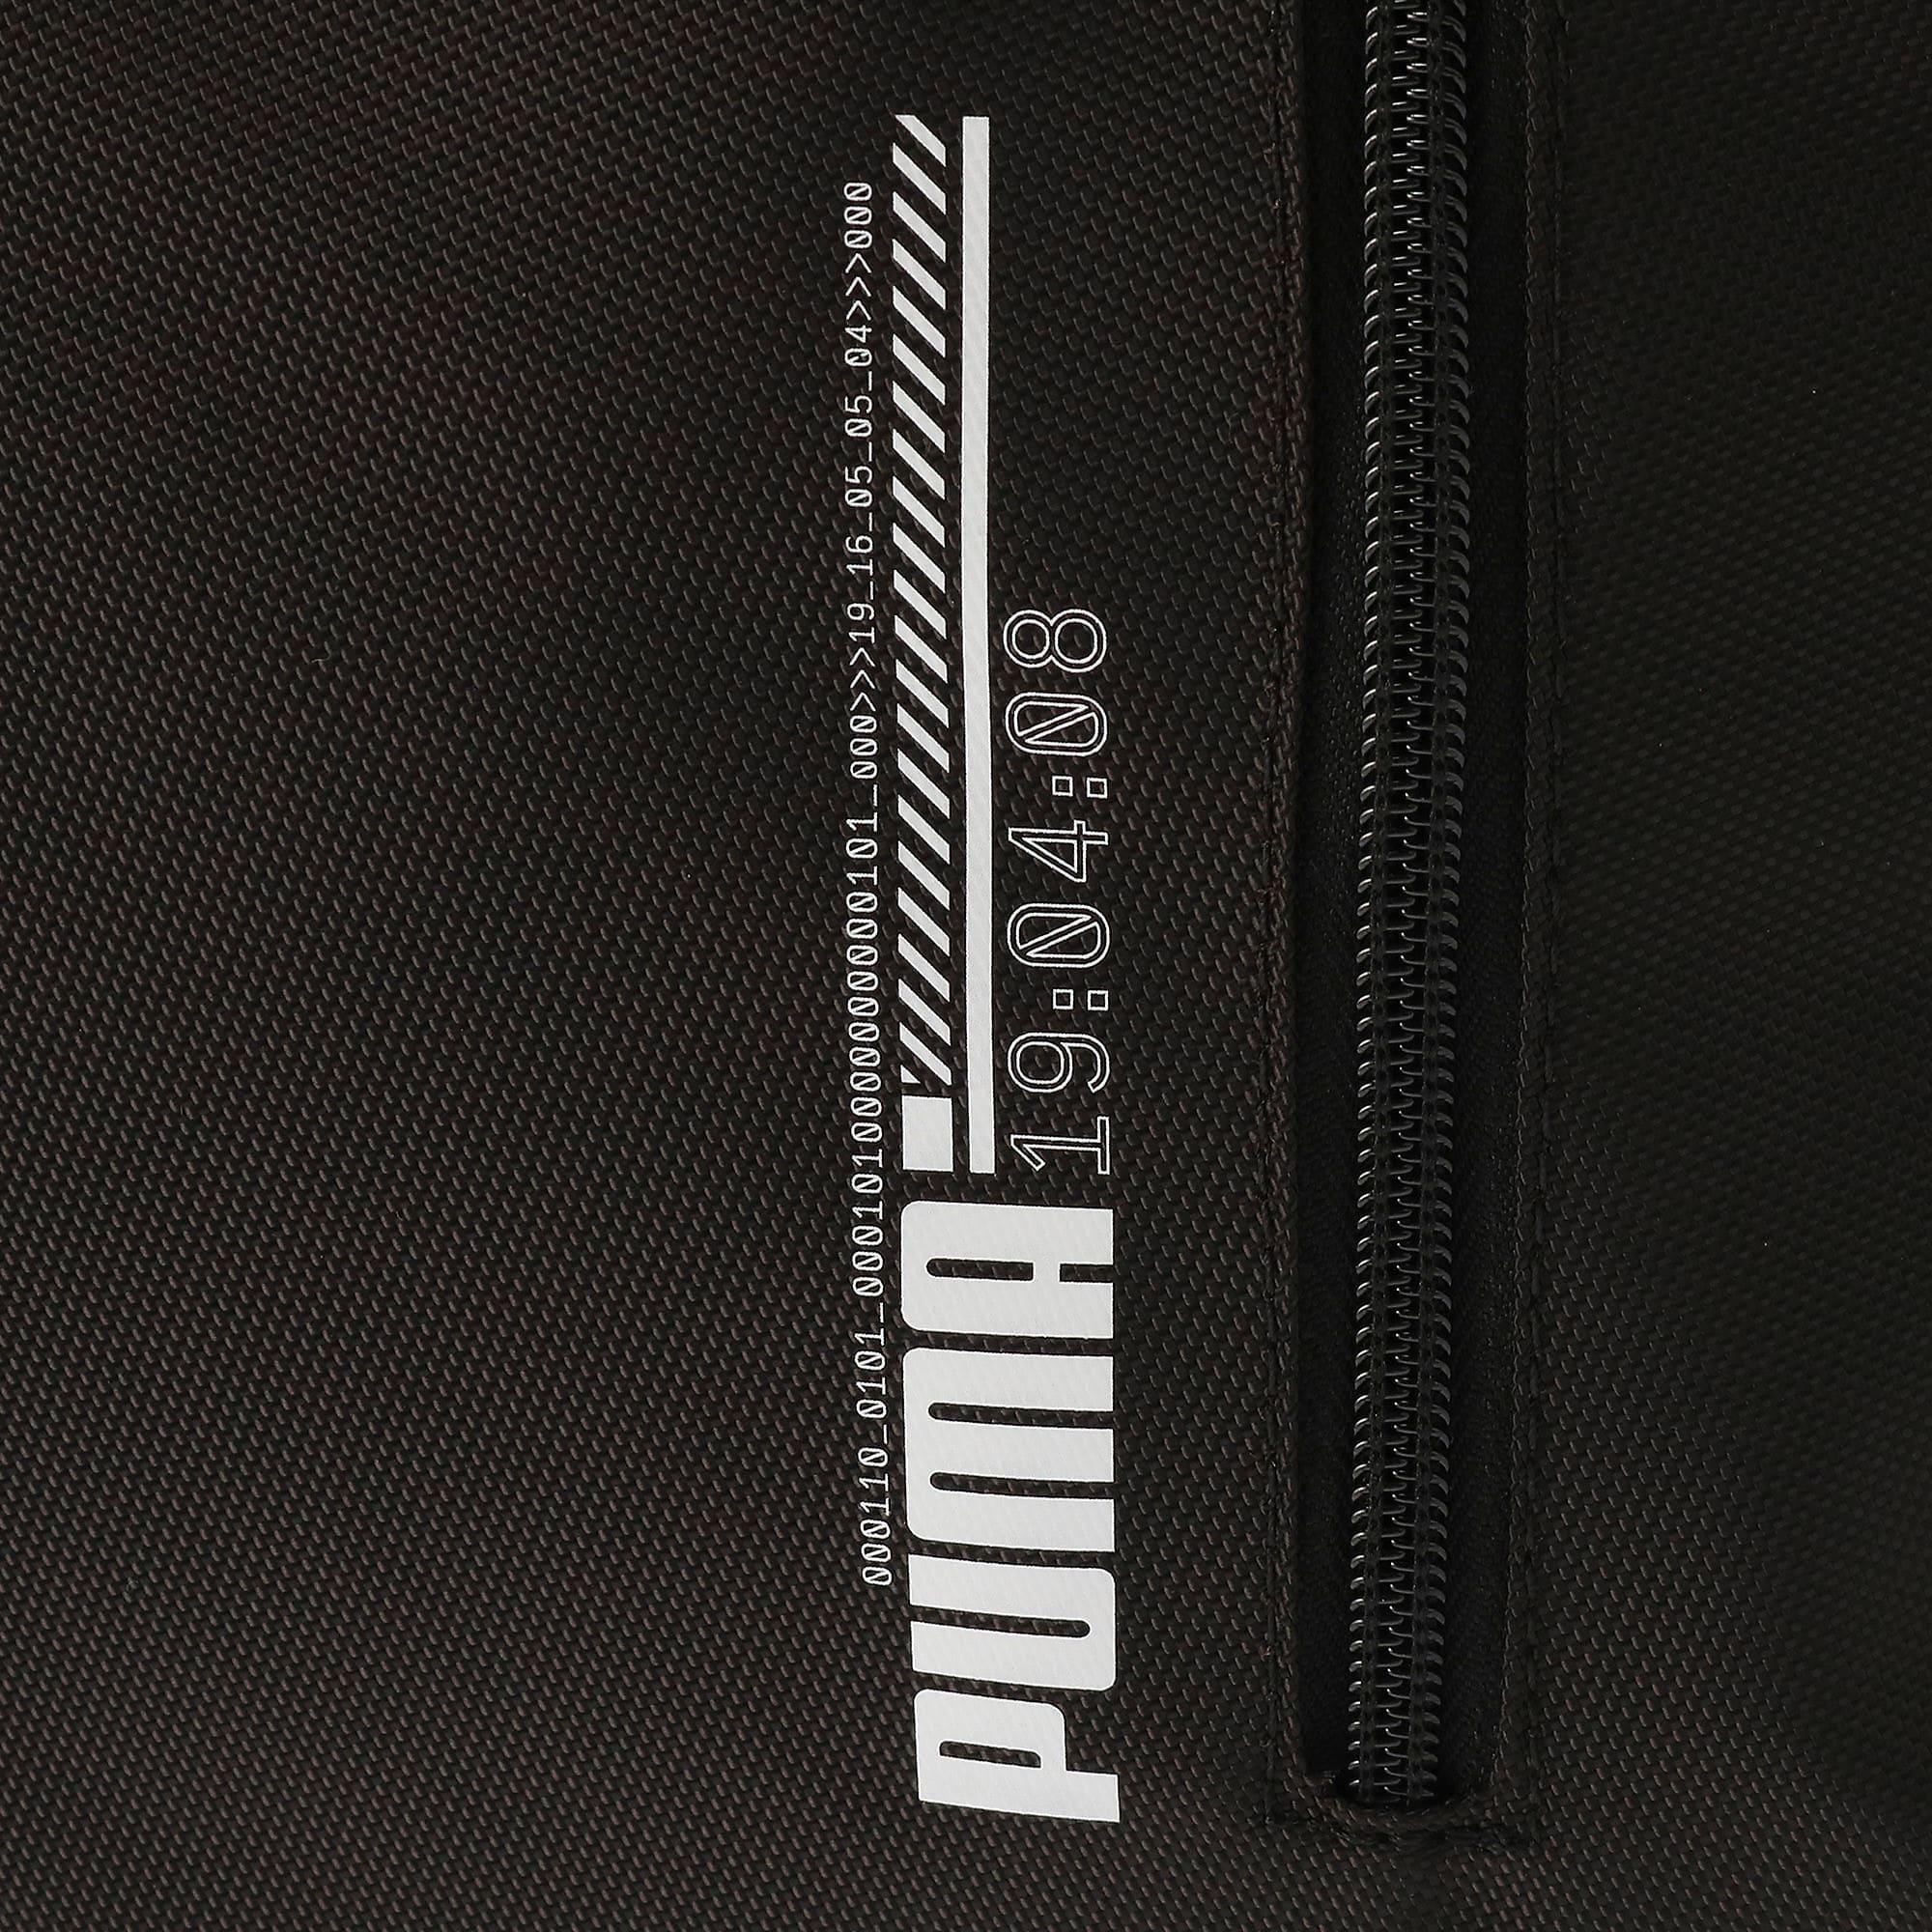 Thumbnail 4 of エナジー ラージトート 25L, Puma Black, medium-JPN